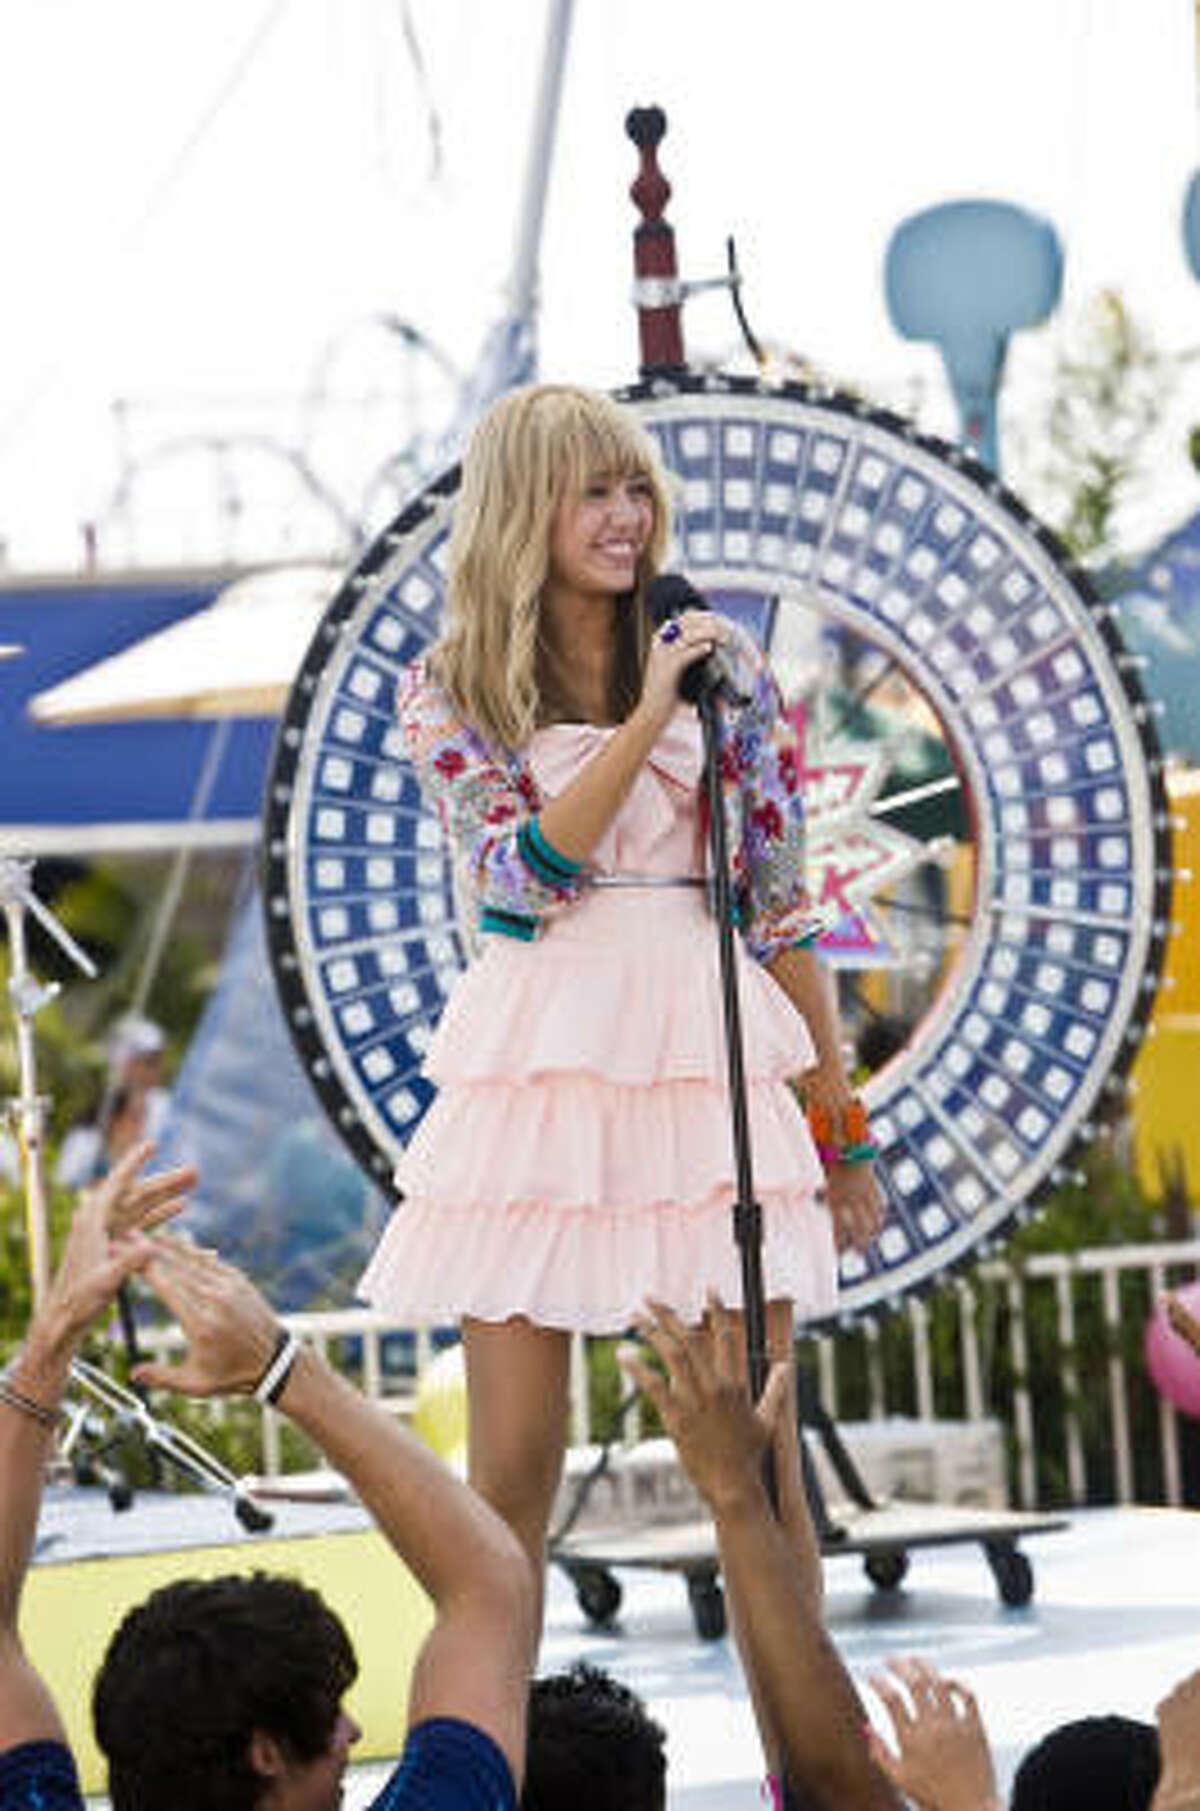 Miley Cyrus stars again in the Disney film Hannah Montana: The Movie.